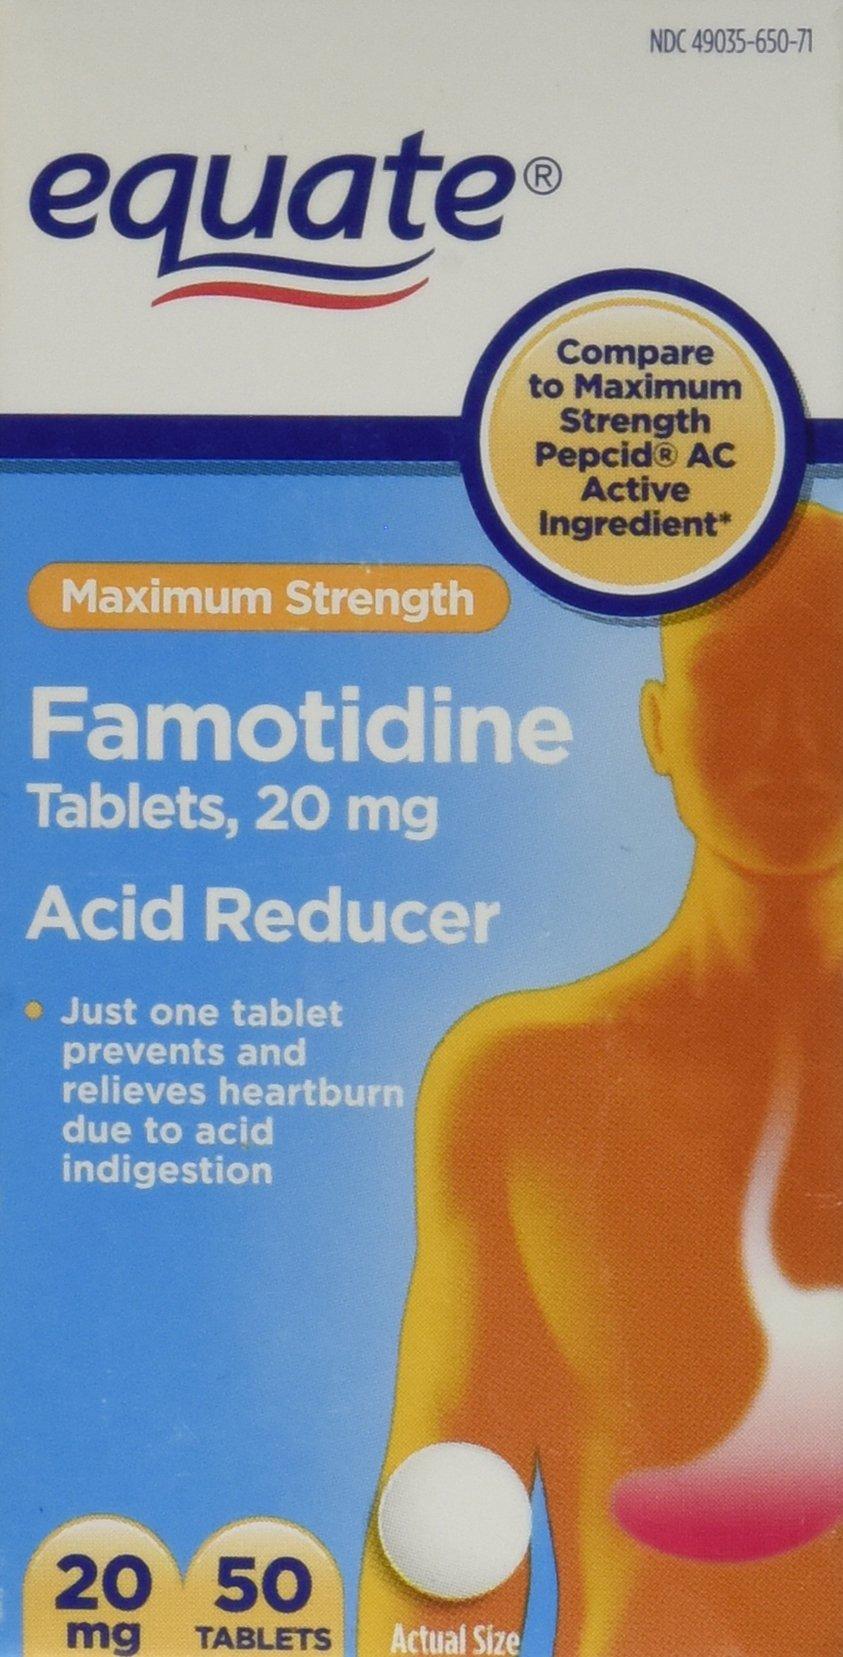 Equate Famotidine Acid Reducer Tablets 20mg, 50ct